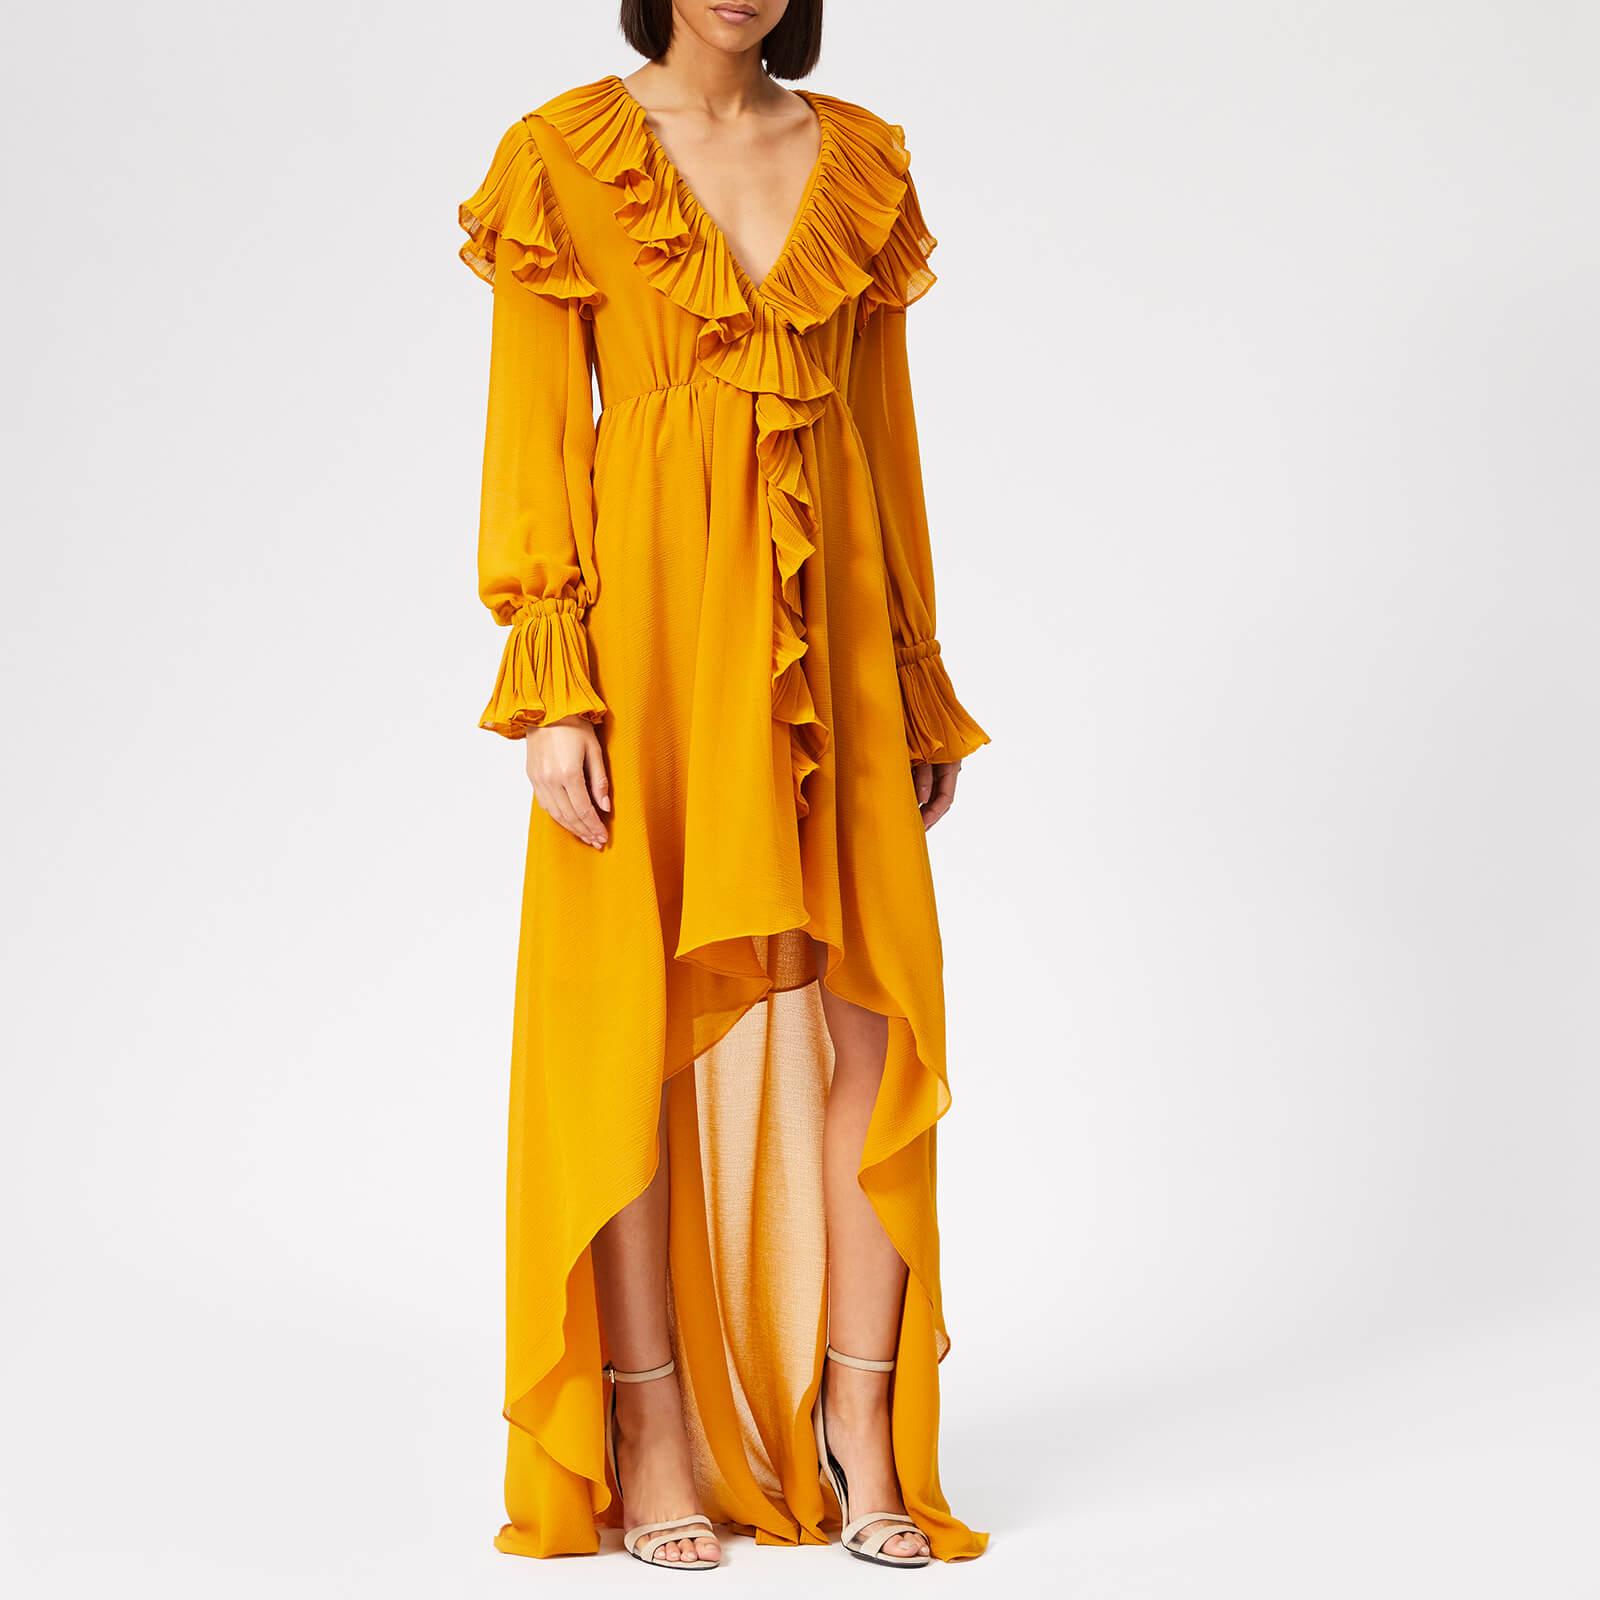 13bde734108b Philosophy di Lorenzo Serafini Women s Ruffle Detail Midi Dress - Yellow -  Free UK Delivery over £50